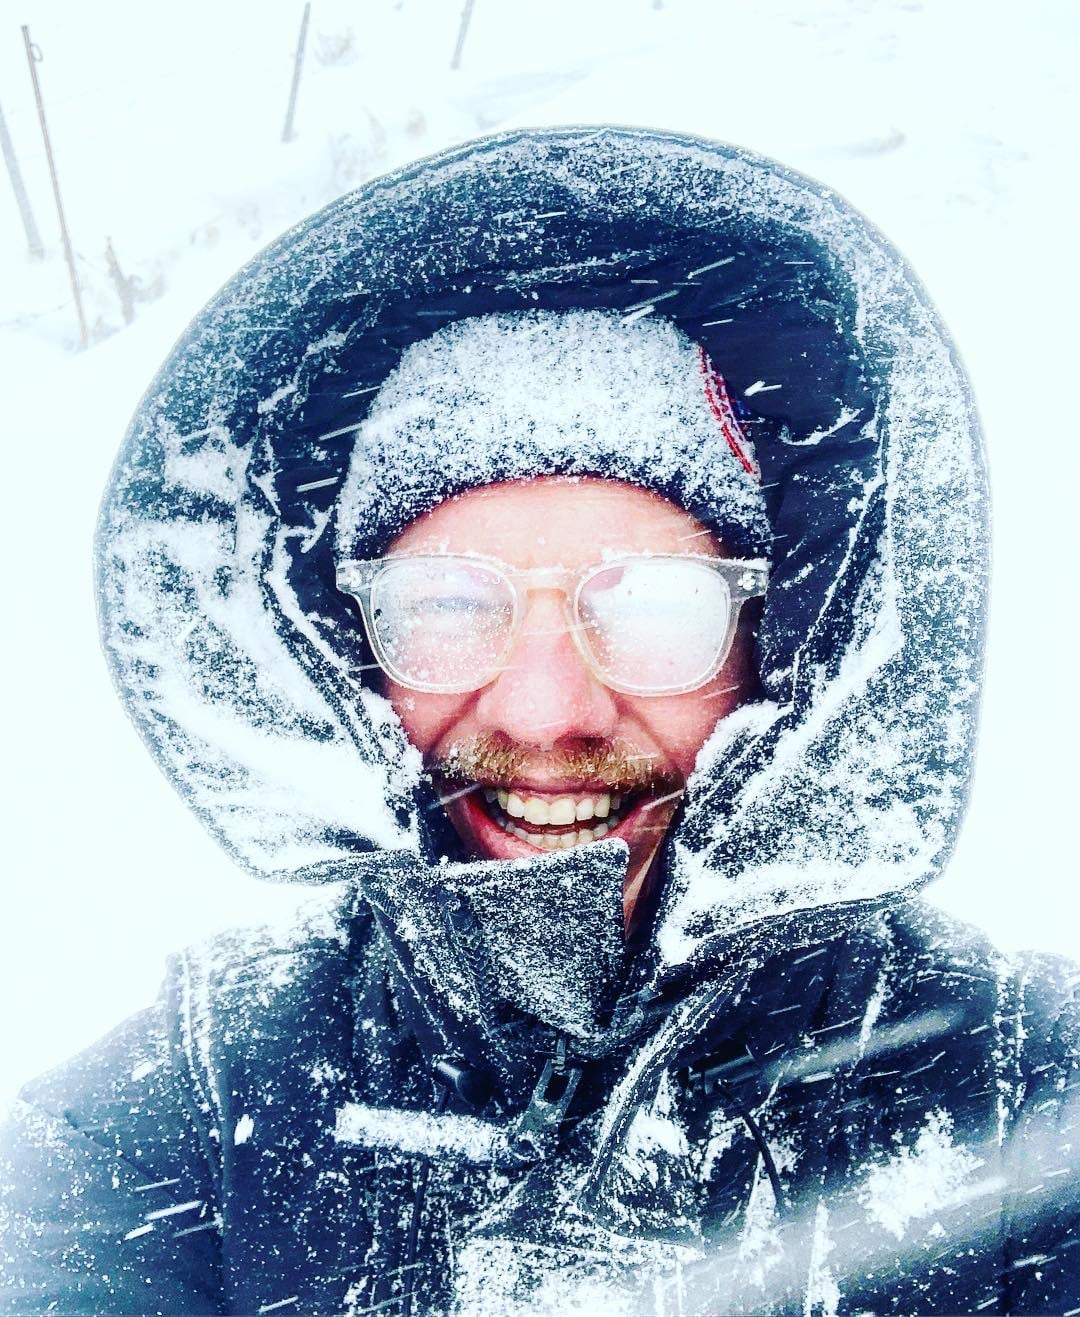 Drei Fragen an Fredrik Harkort | CEO & Founder BodyChange